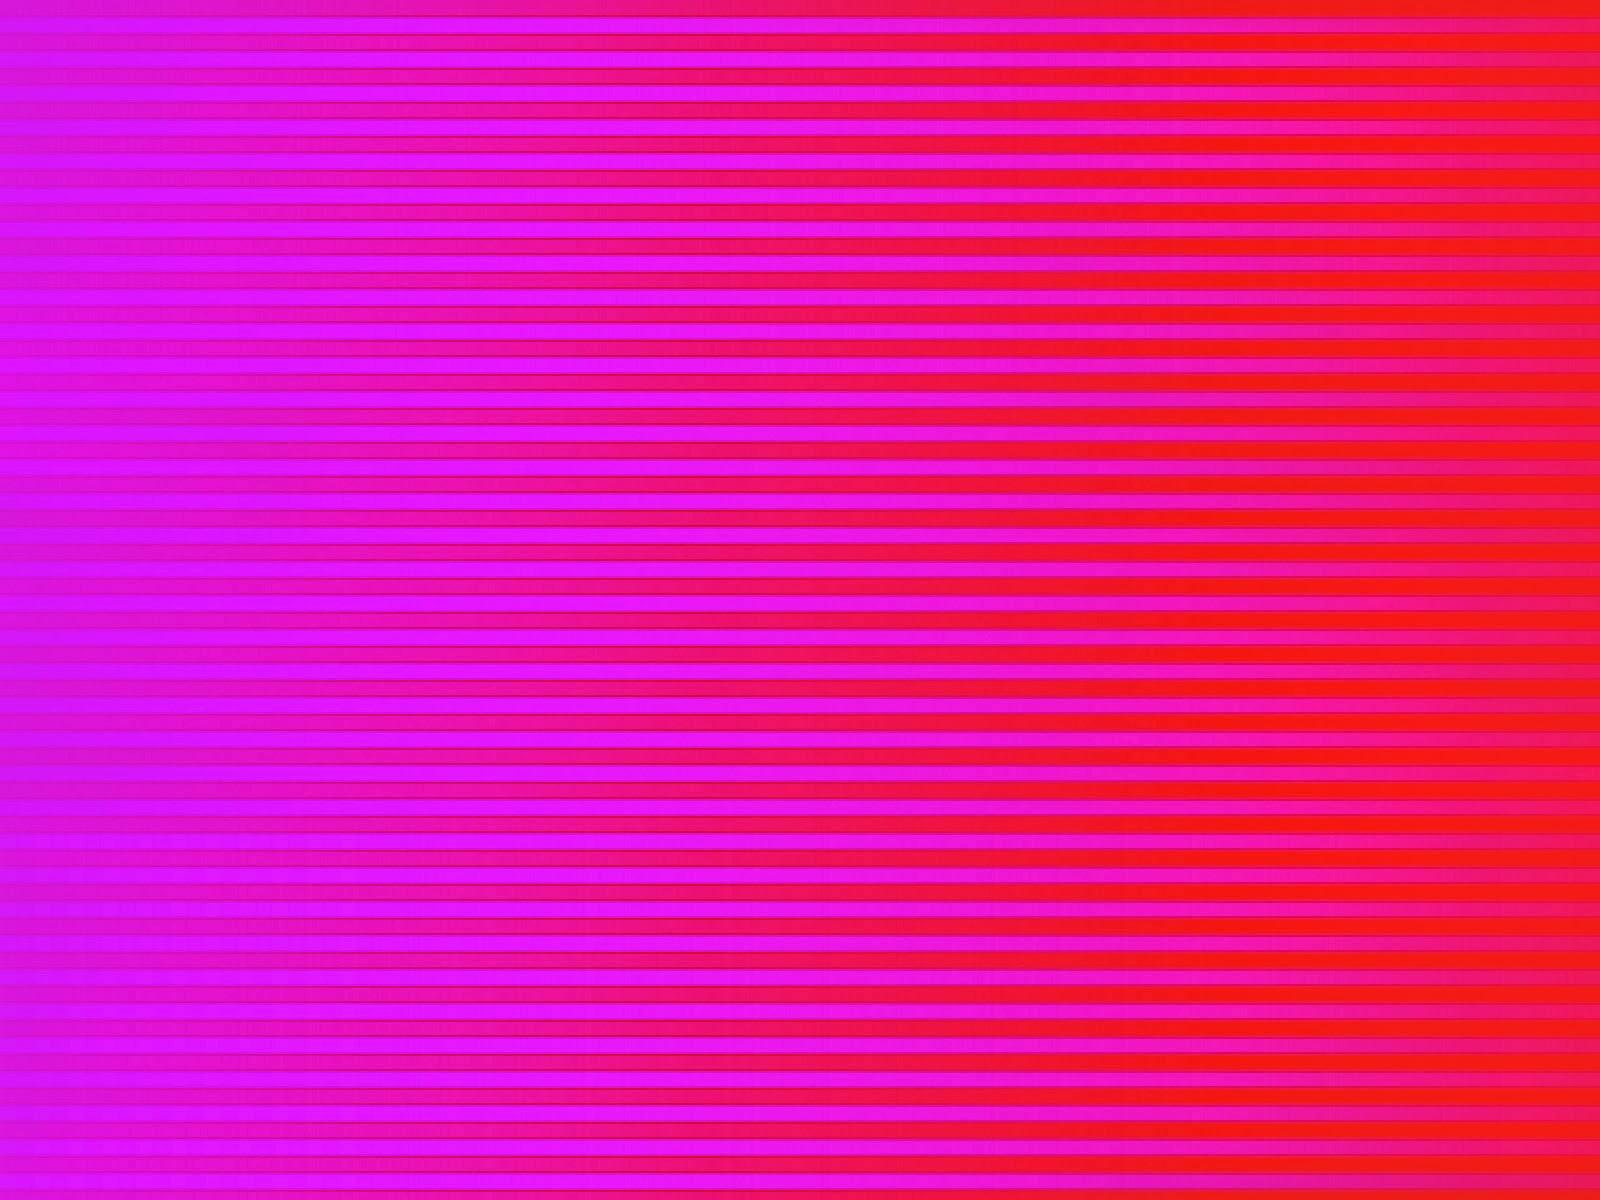 Pink pattern stripes - photo#17